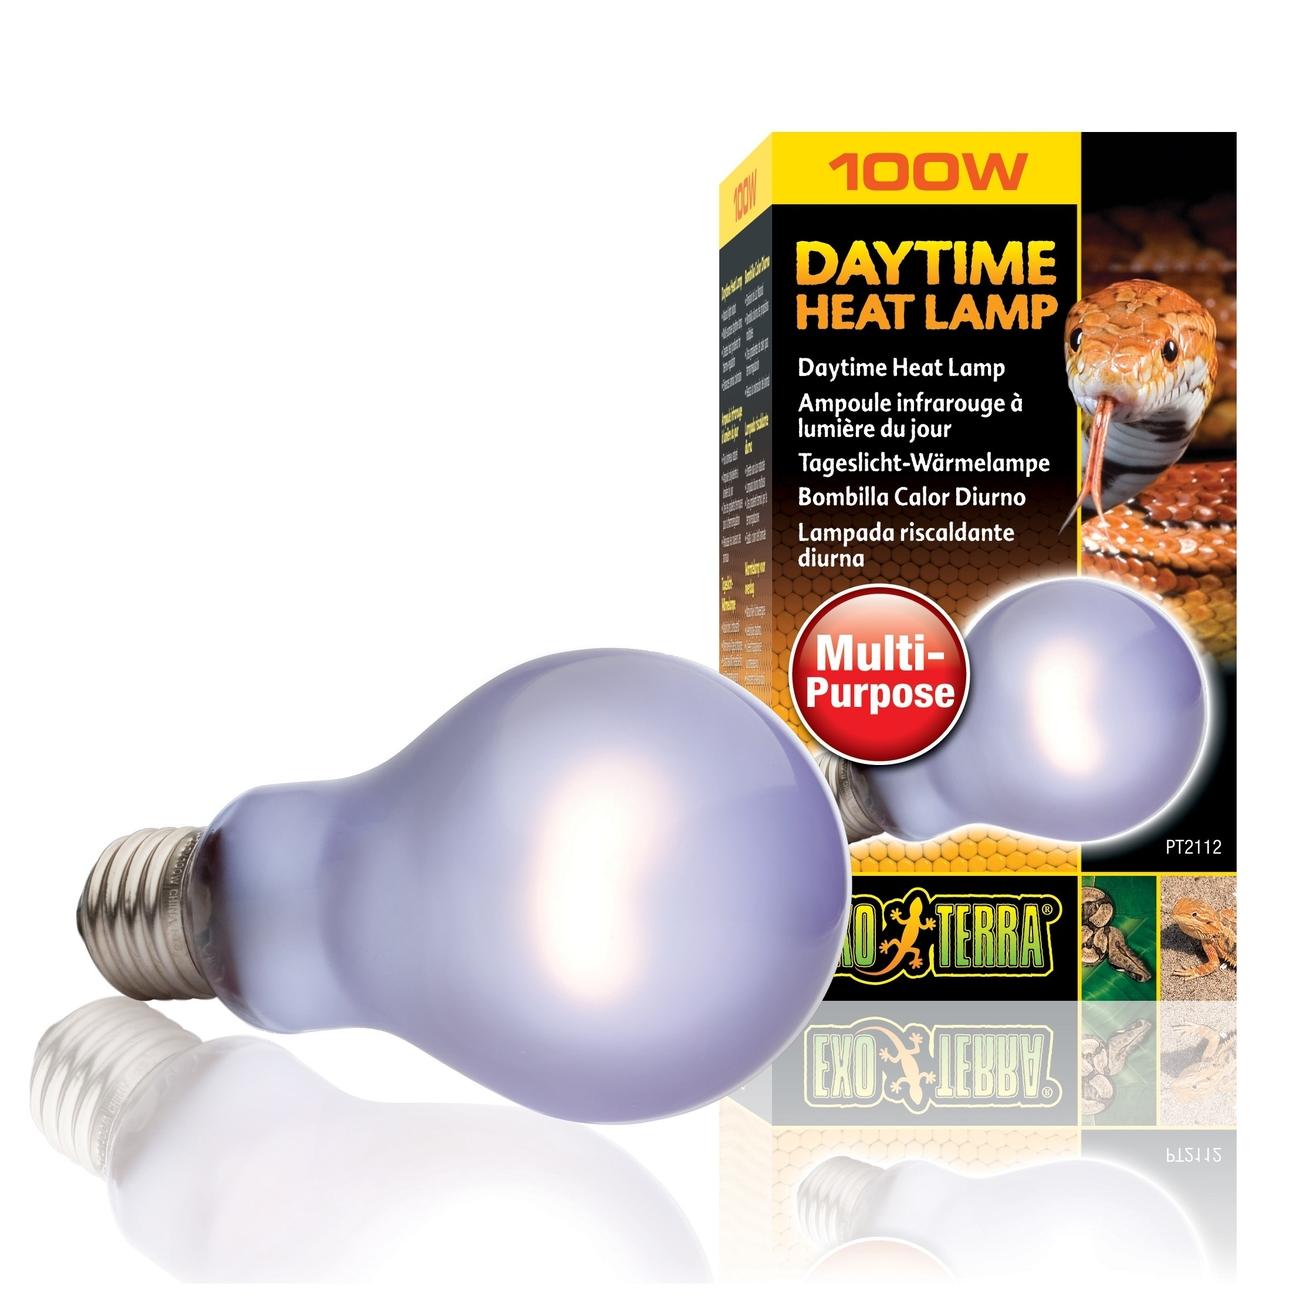 Exo Terra - Daytime Heat Lampe Bild 9